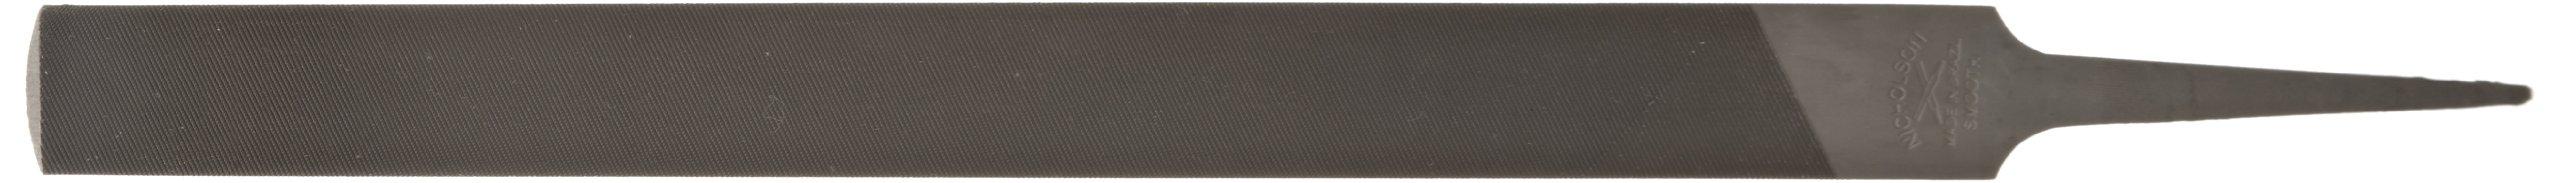 Nicholson Hand File (Boxed), American Pattern, Double Cut, Half-Round, Coarse, 16'' Length